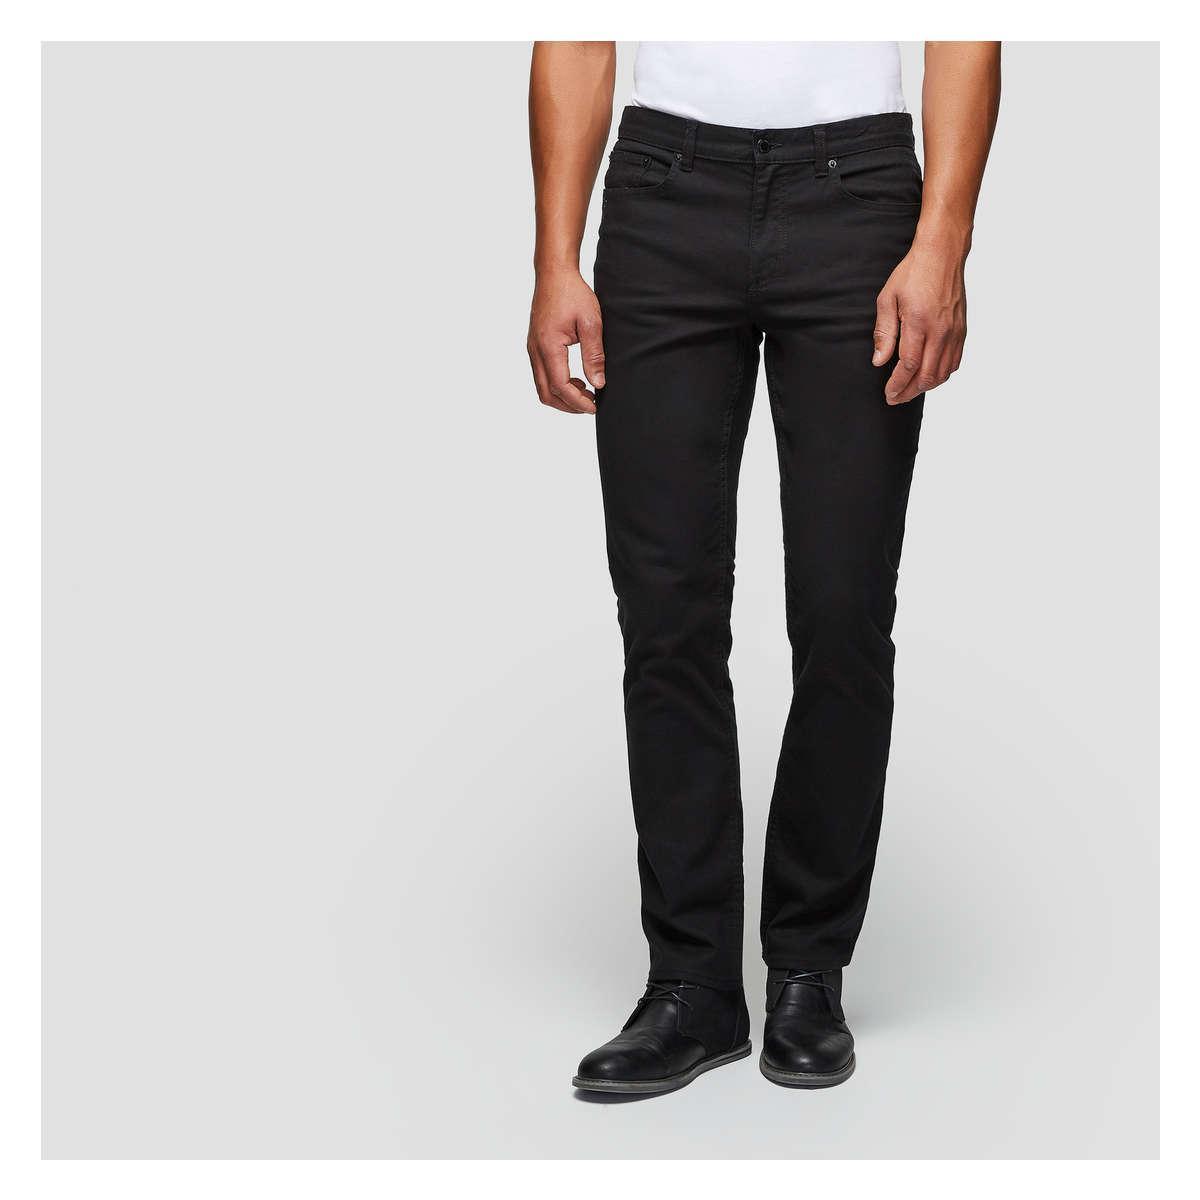 f794b61c43 Lyst - Joe Fresh Men s Slim Straight Chino in Black for Men - Save 15%